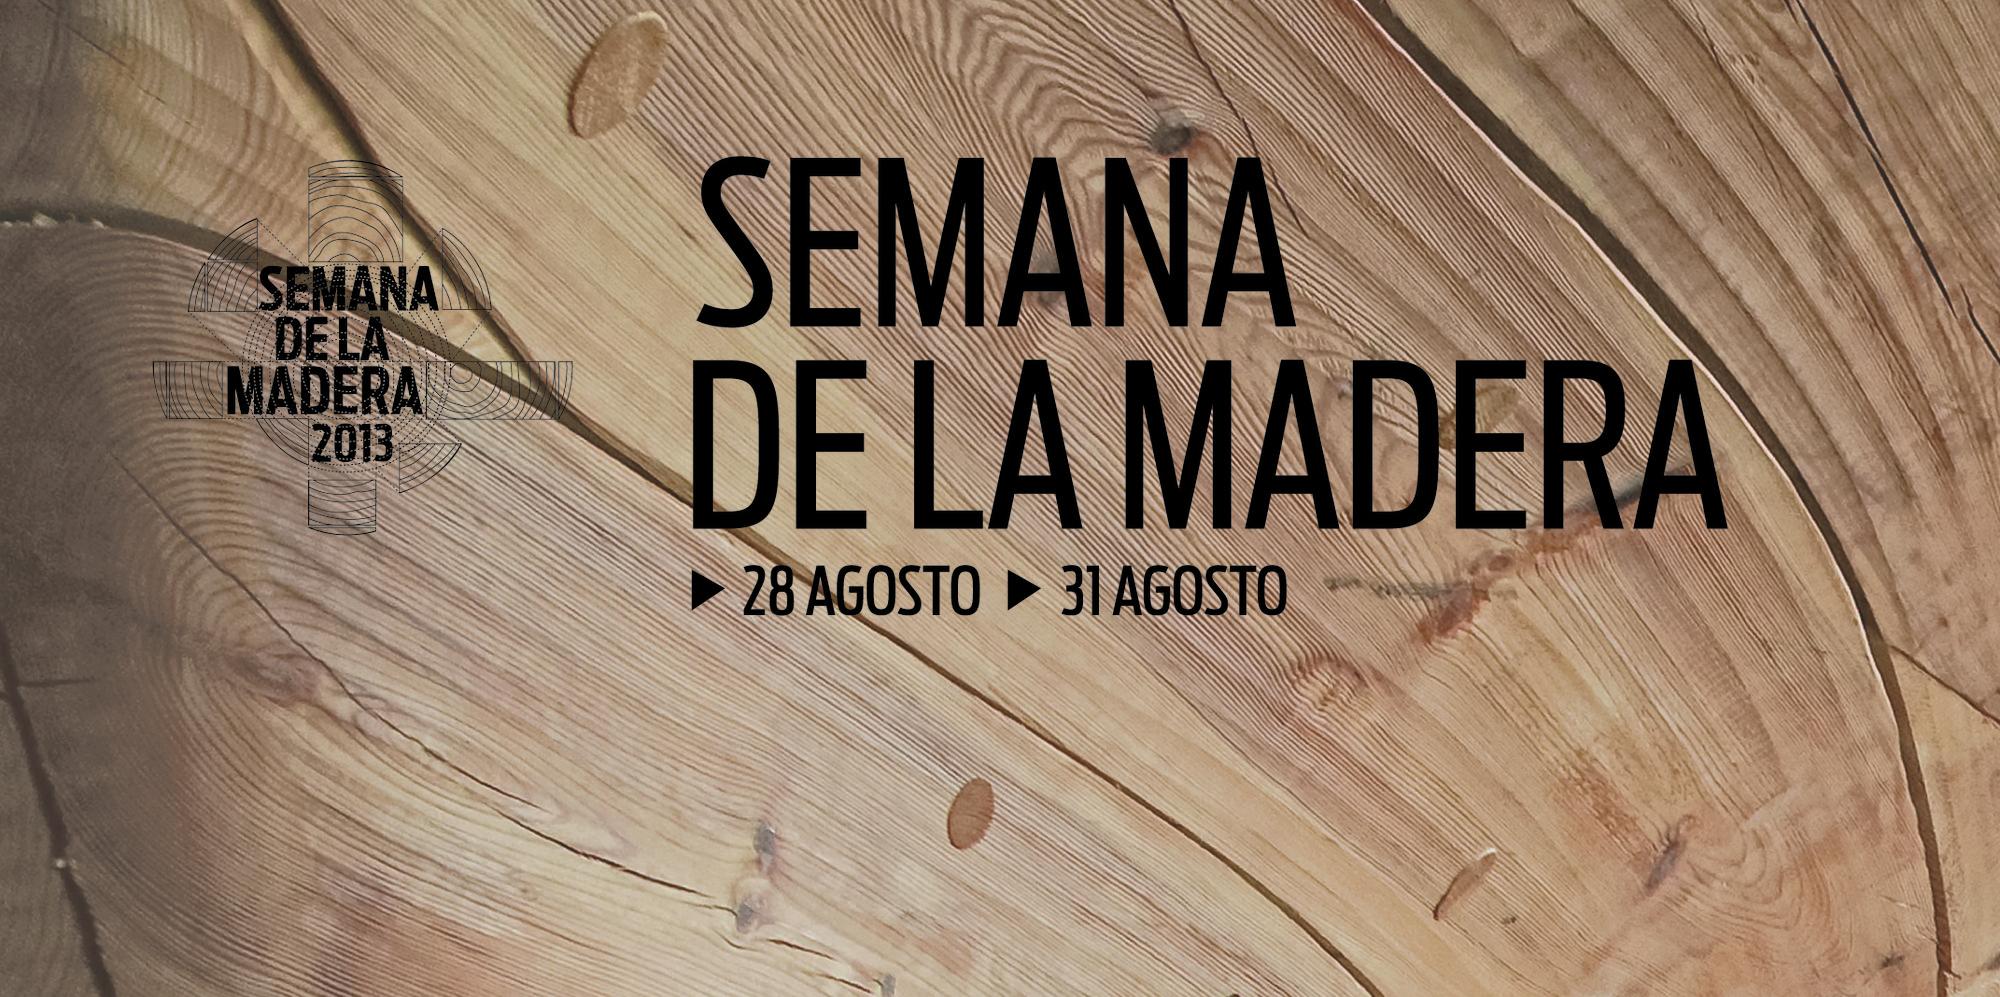 Semana de la Madera 28 - 31 Agosto